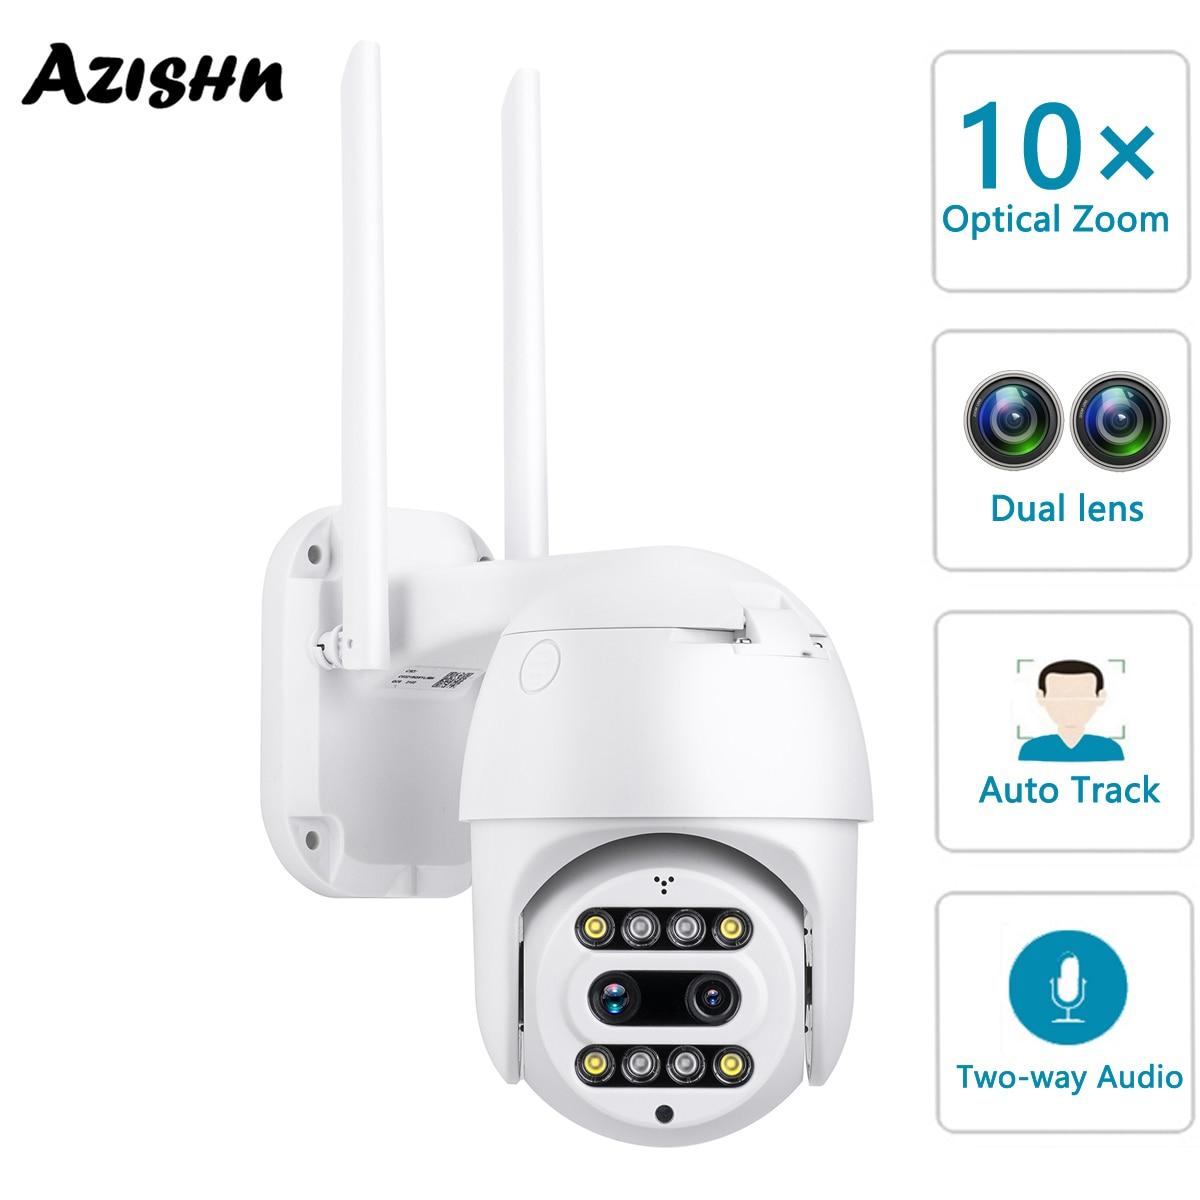 AZISHN 3MP كاميرا IP واي فاي PTZ 10X التكبير المزدوج عدسة الكاميرا اتجاهين الصوت الأمن CCTV قبة كاميرا مقاوم للماء P2P سرعة السيارات تتبع